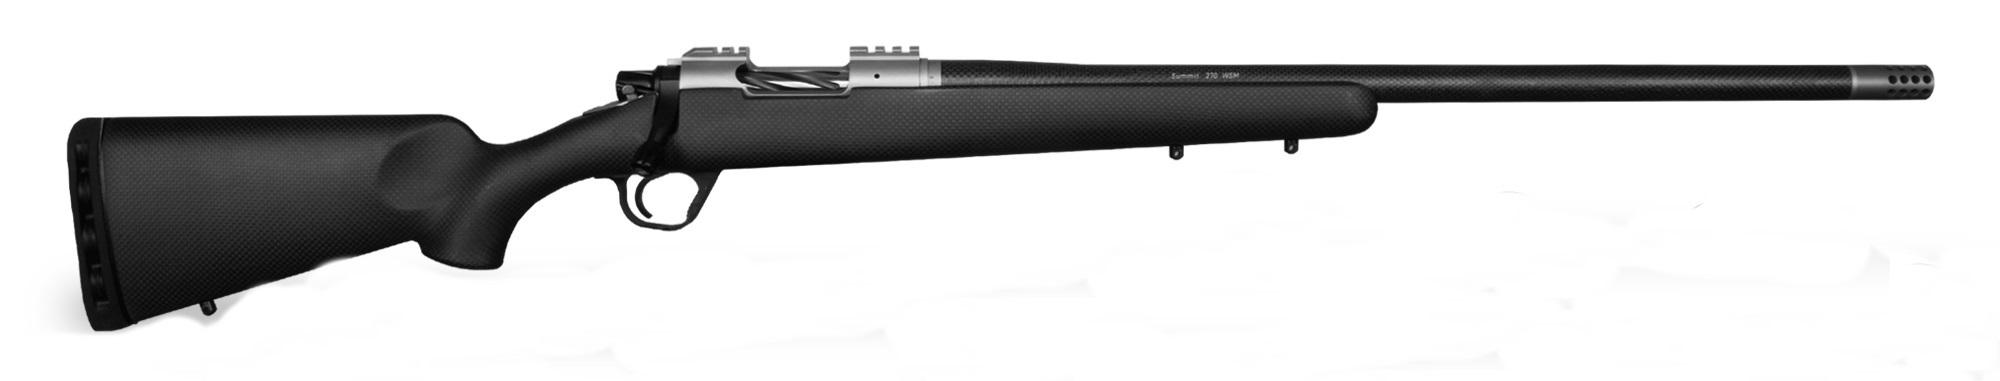 Christensen Arms Summit Ti 300 Win Mag